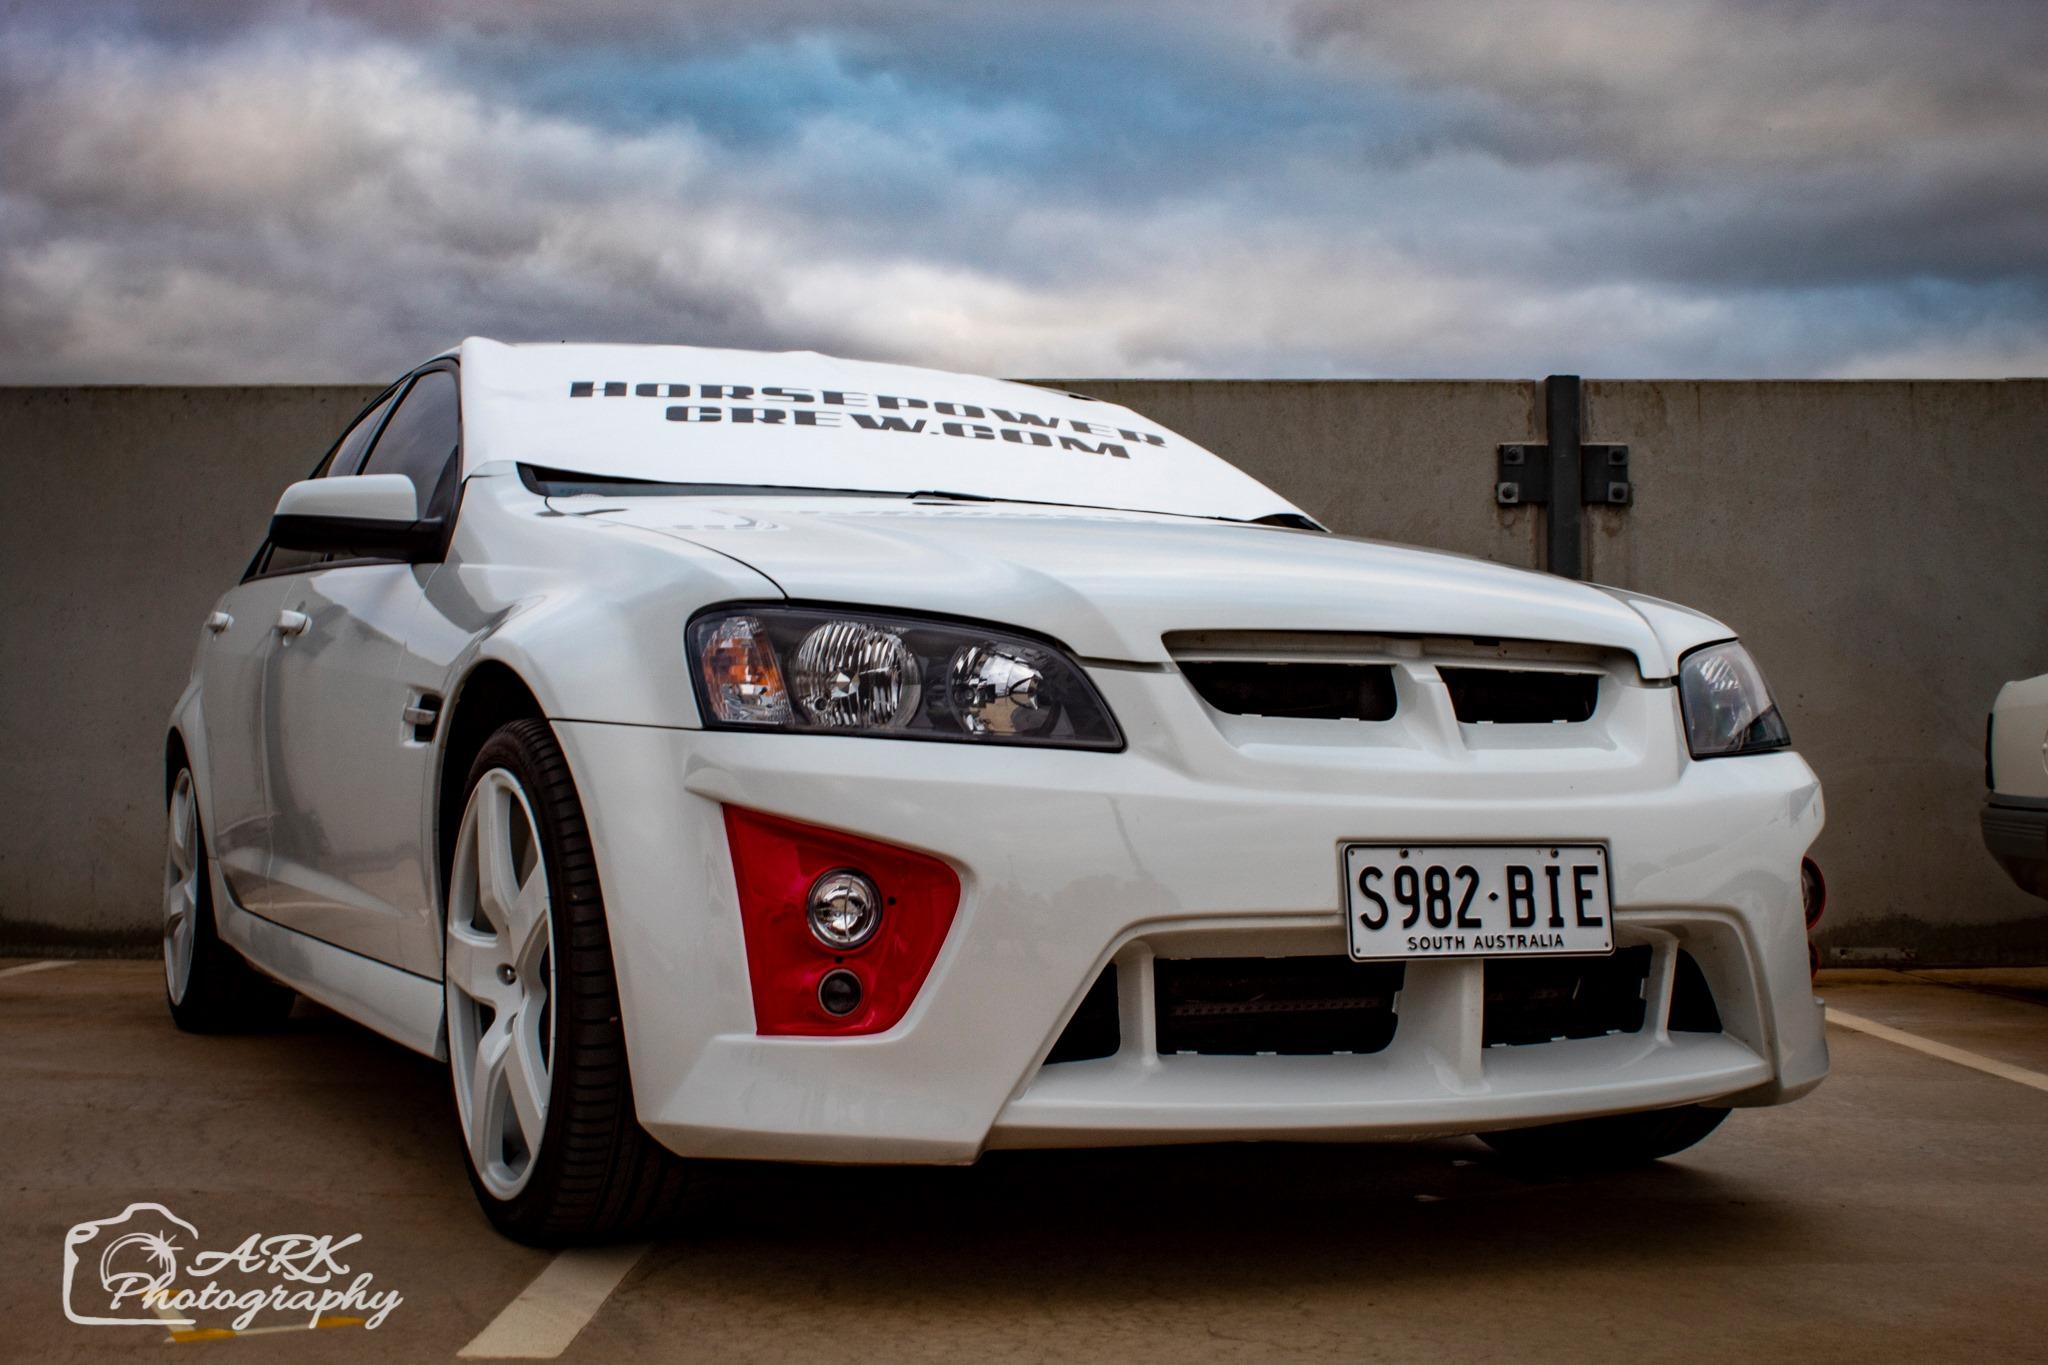 windscreen-cover-dot-com-Modern-size-white-and-Black-Holden